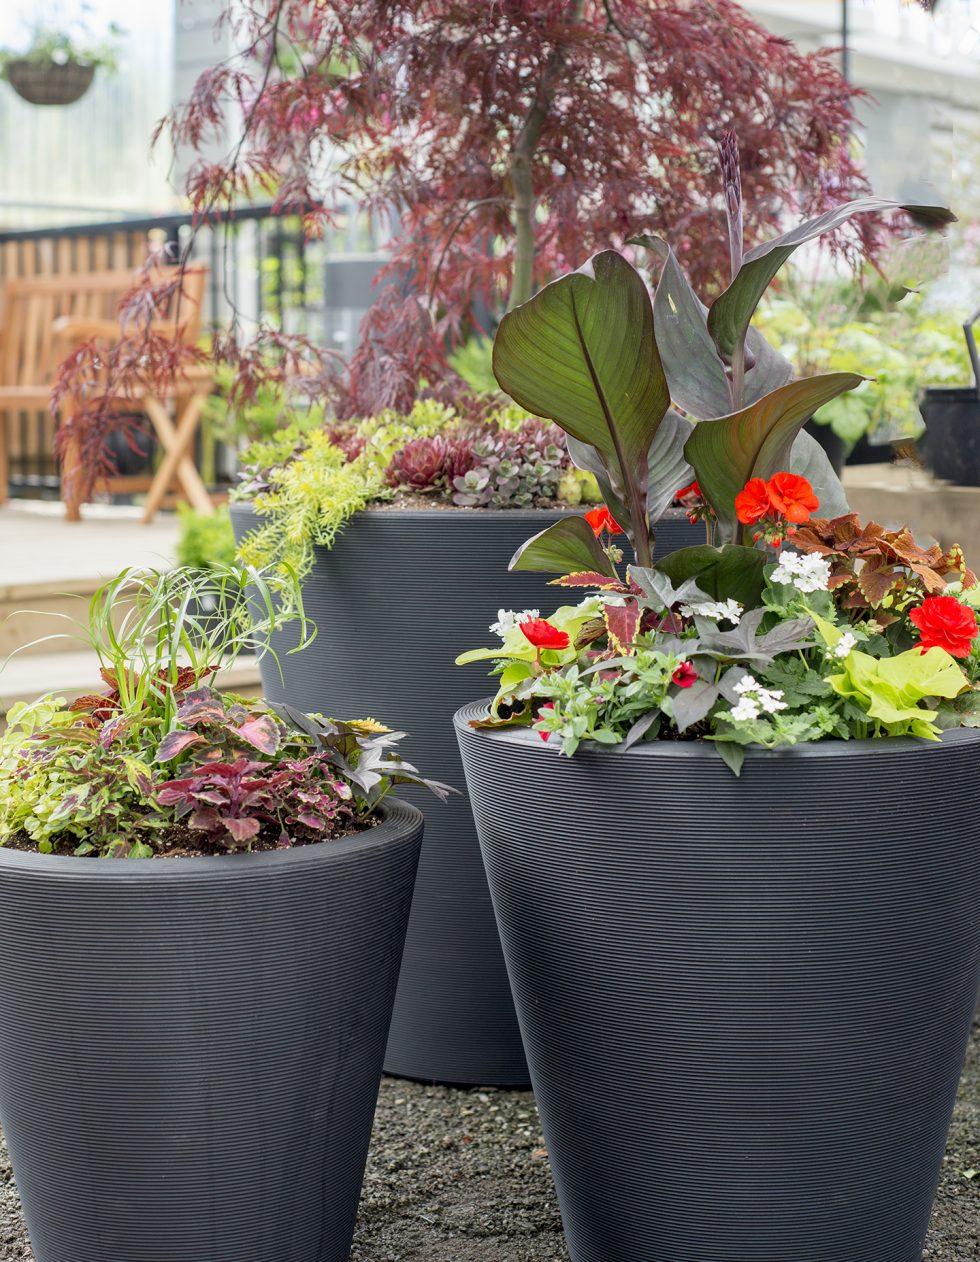 container gardening ideas for inspiration - Garden Ideas Pots